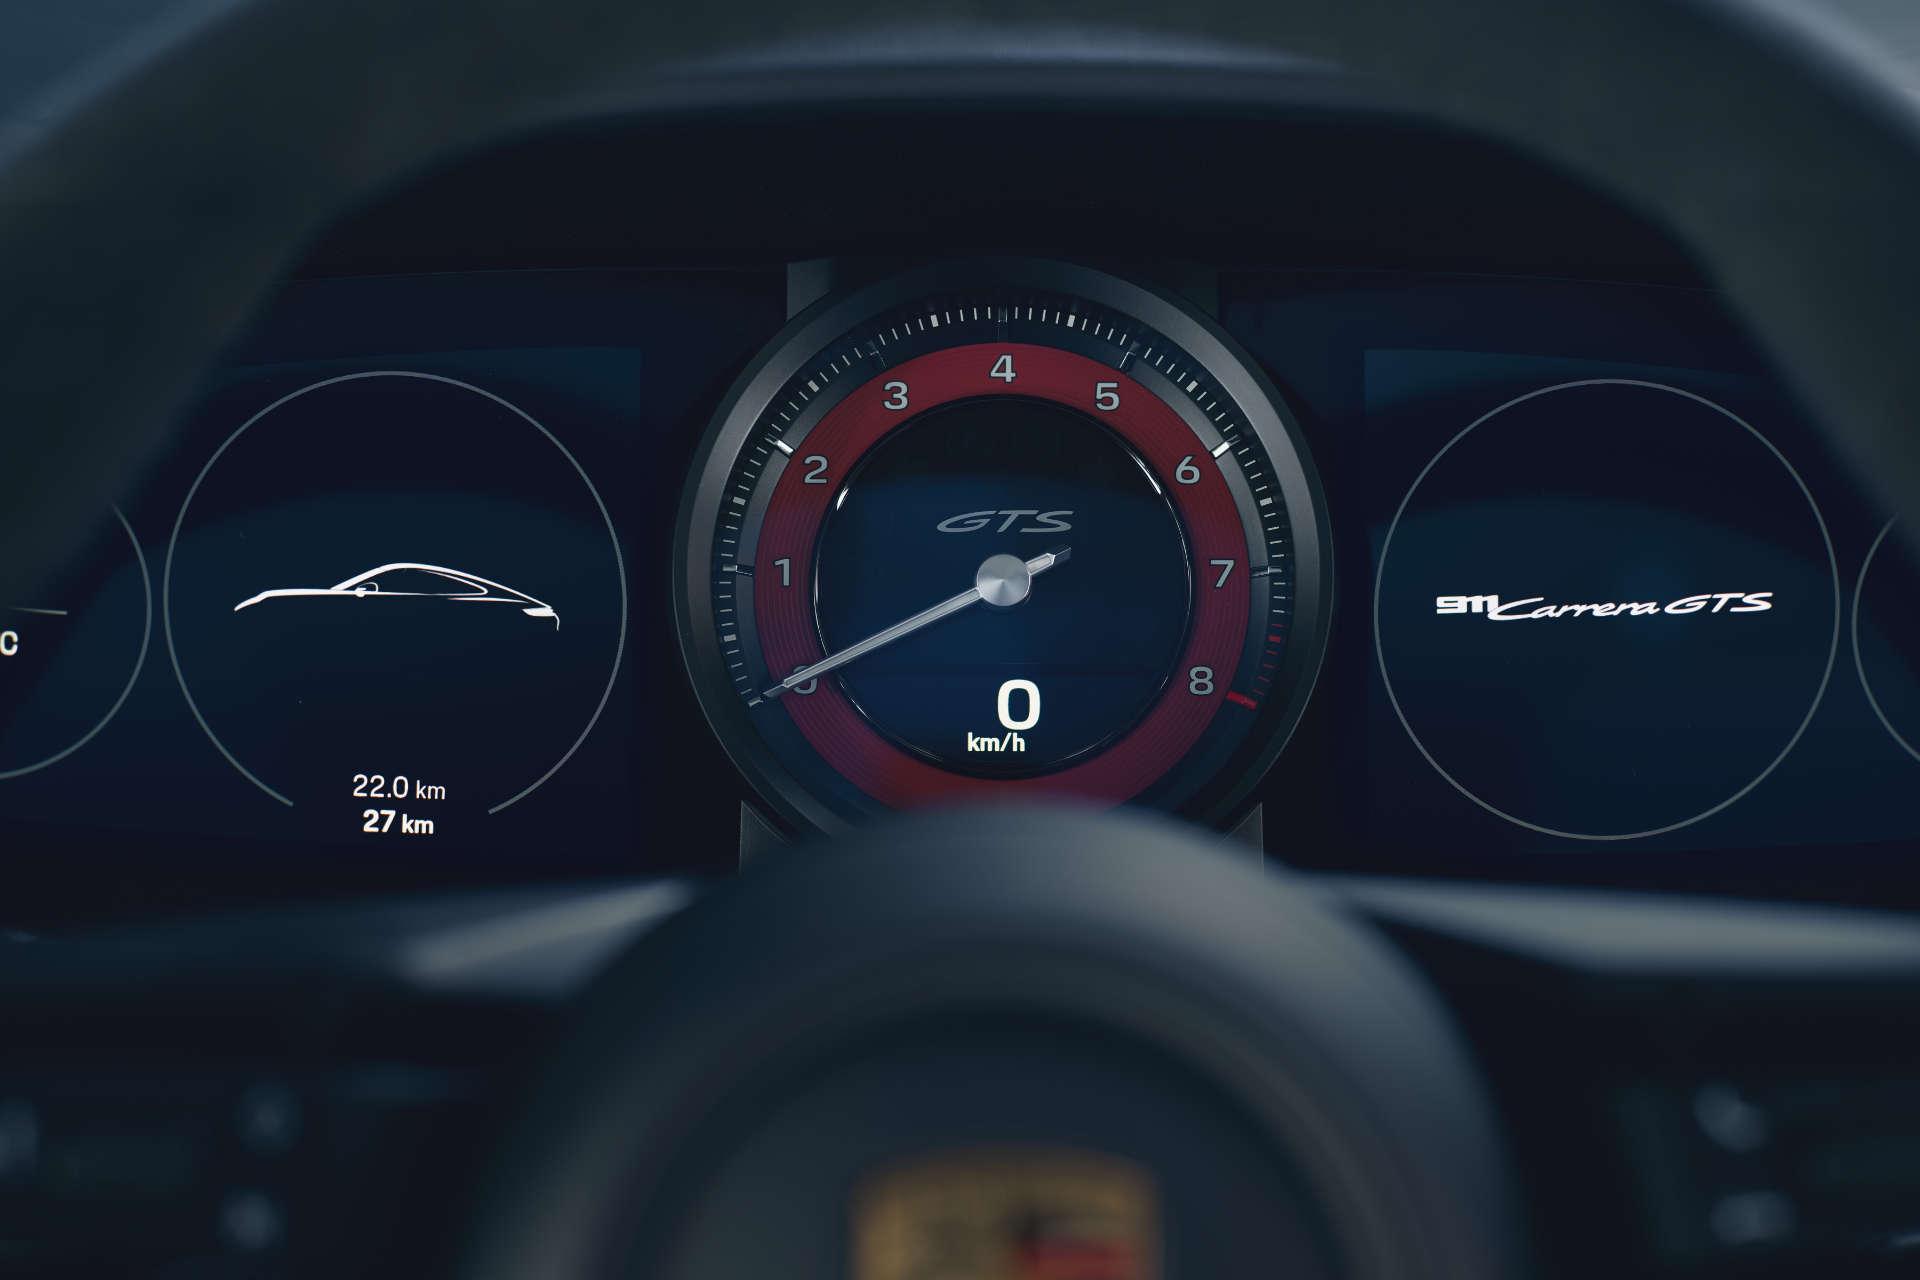 Porsche 911 GTS Tacho